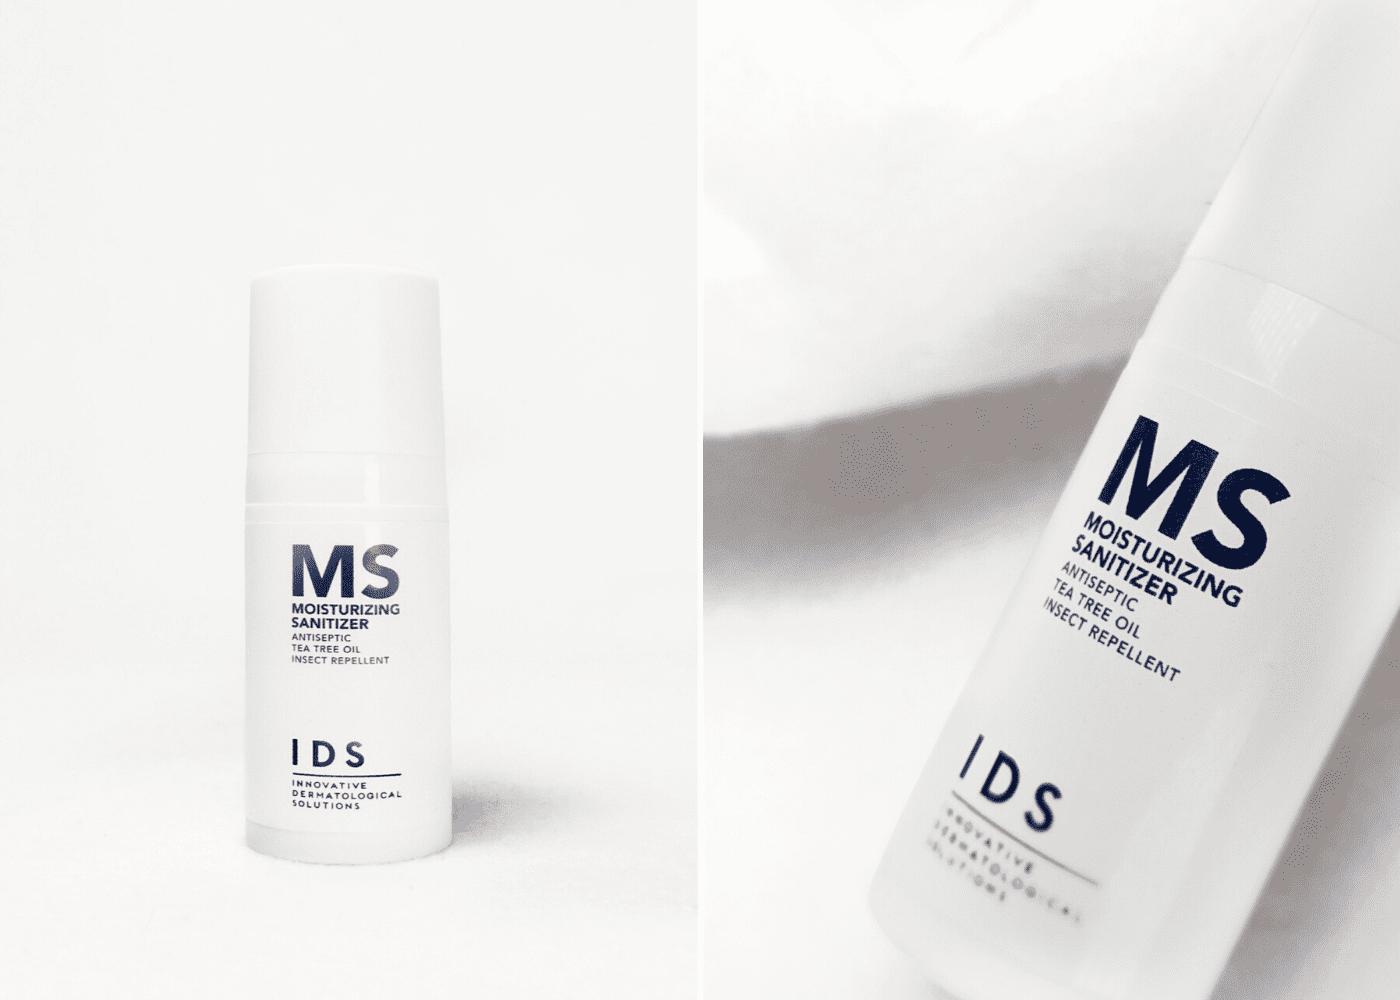 IDS-Skincare-Moisturizing-Sanitiser